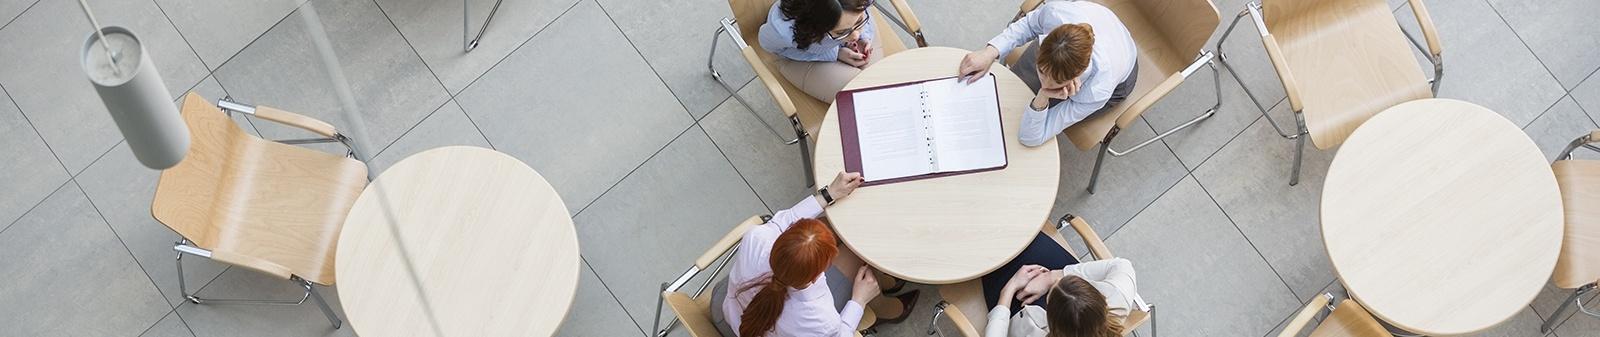 budget builder-edit-SAAF Education blog.jpg